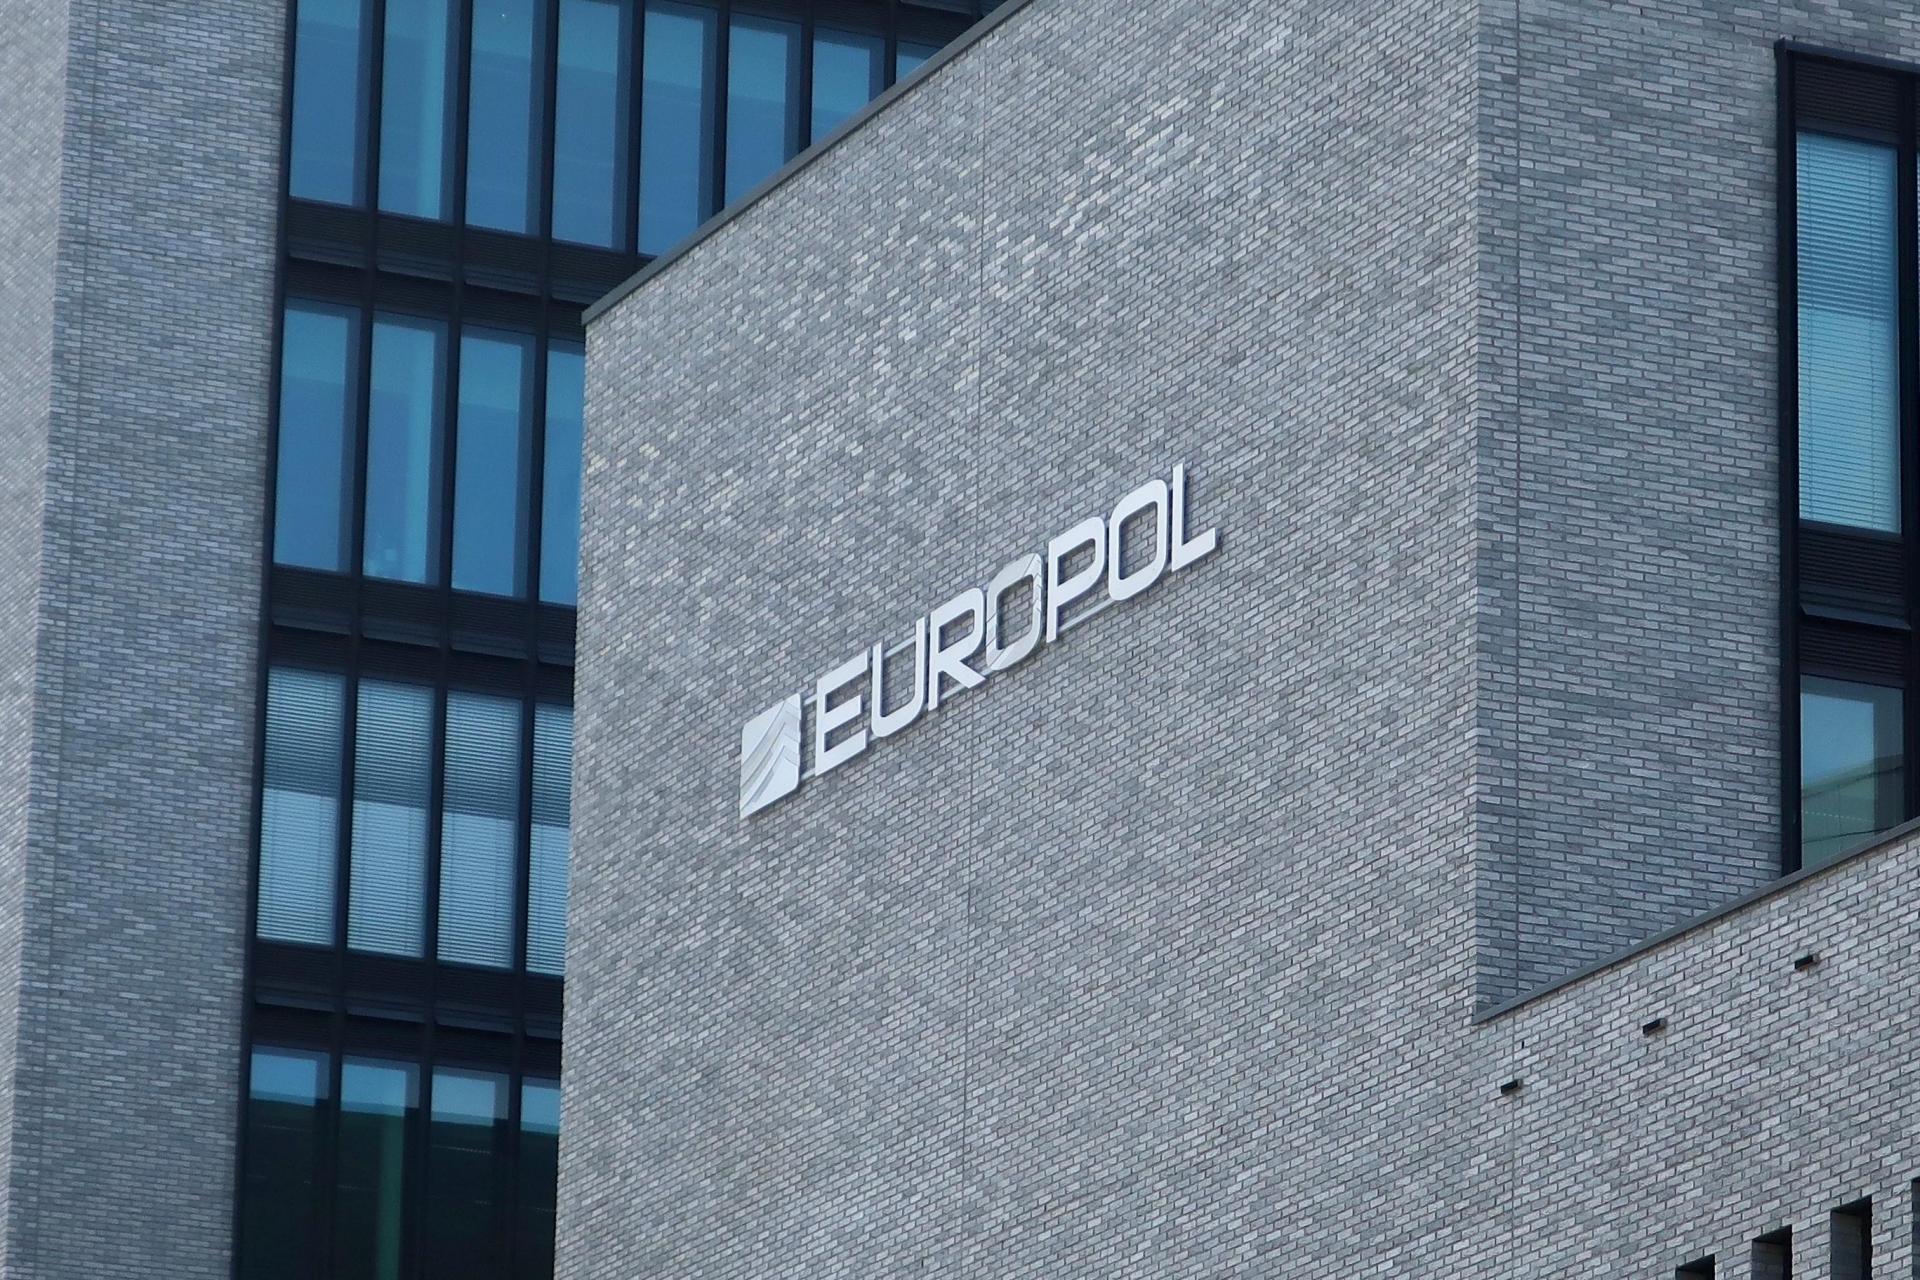 Europol headquarters in The Hague. Photo: Shutterstock